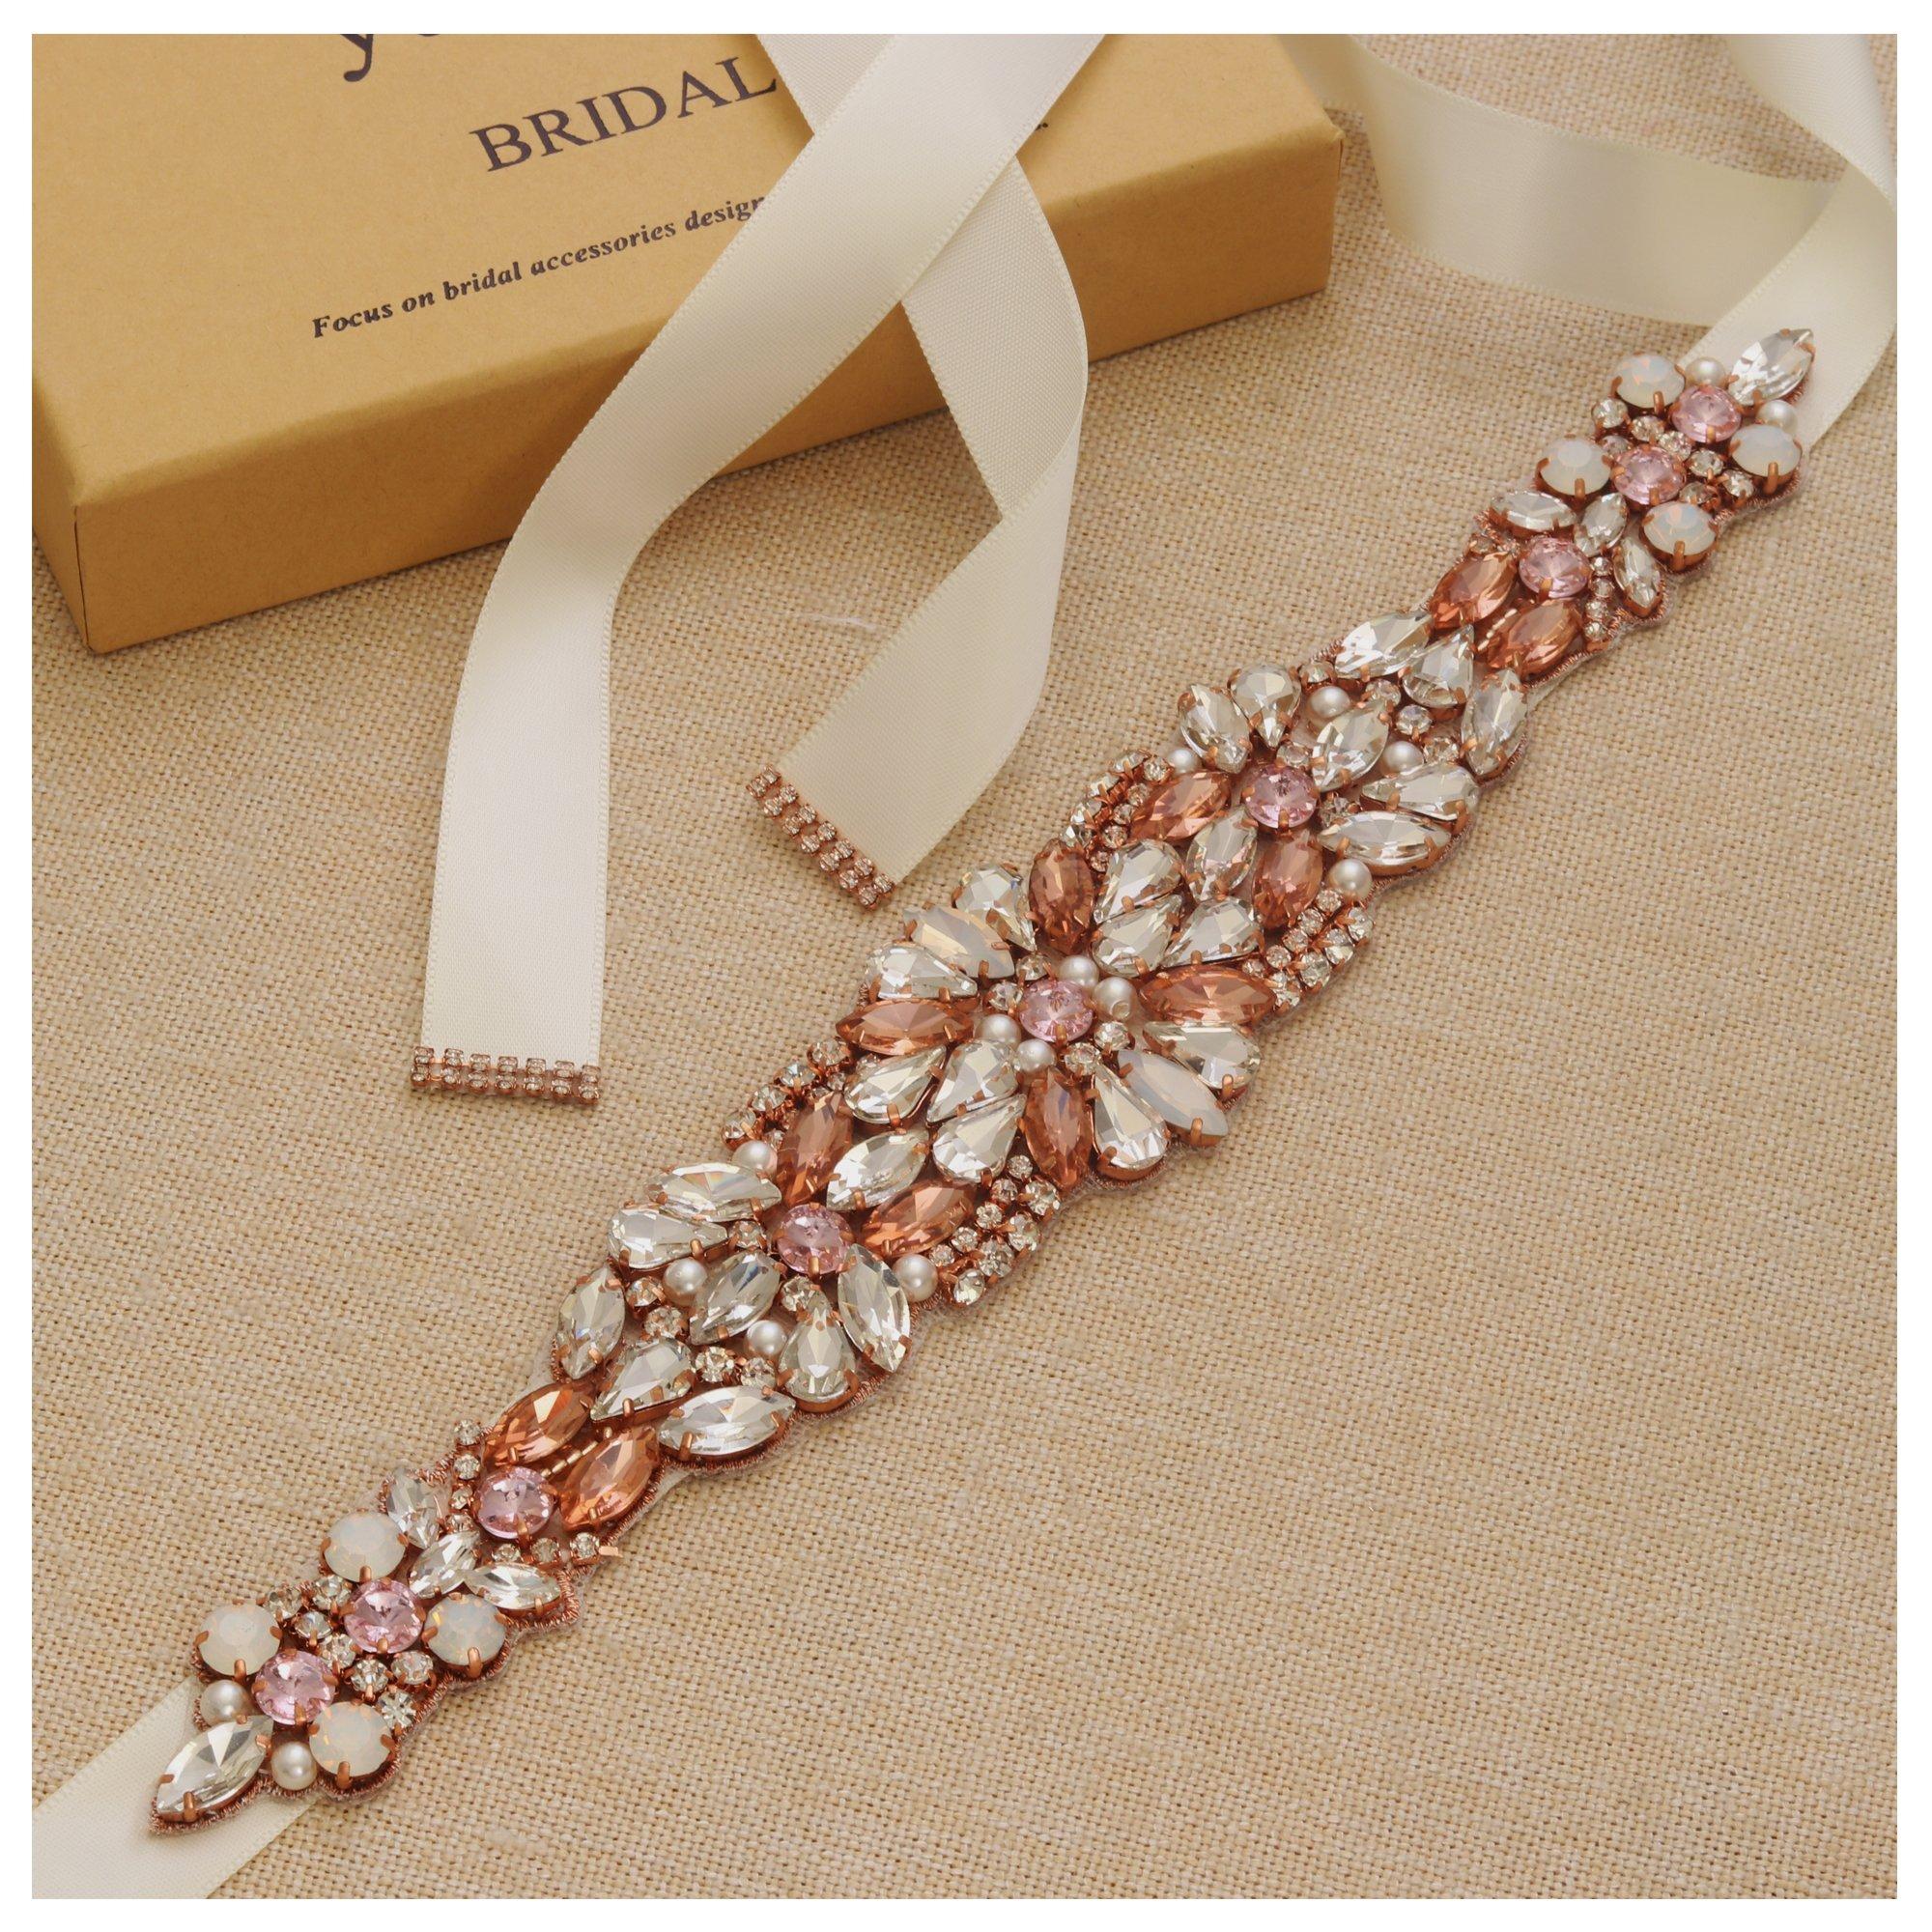 Yanstar Handmade Rose Gold Pearl Rhinestone Crystal Opal Wedding Bridal Belt Sash With Ivory Ribbon For Wedding Bridesmaid Womens Prom Gowns Dress